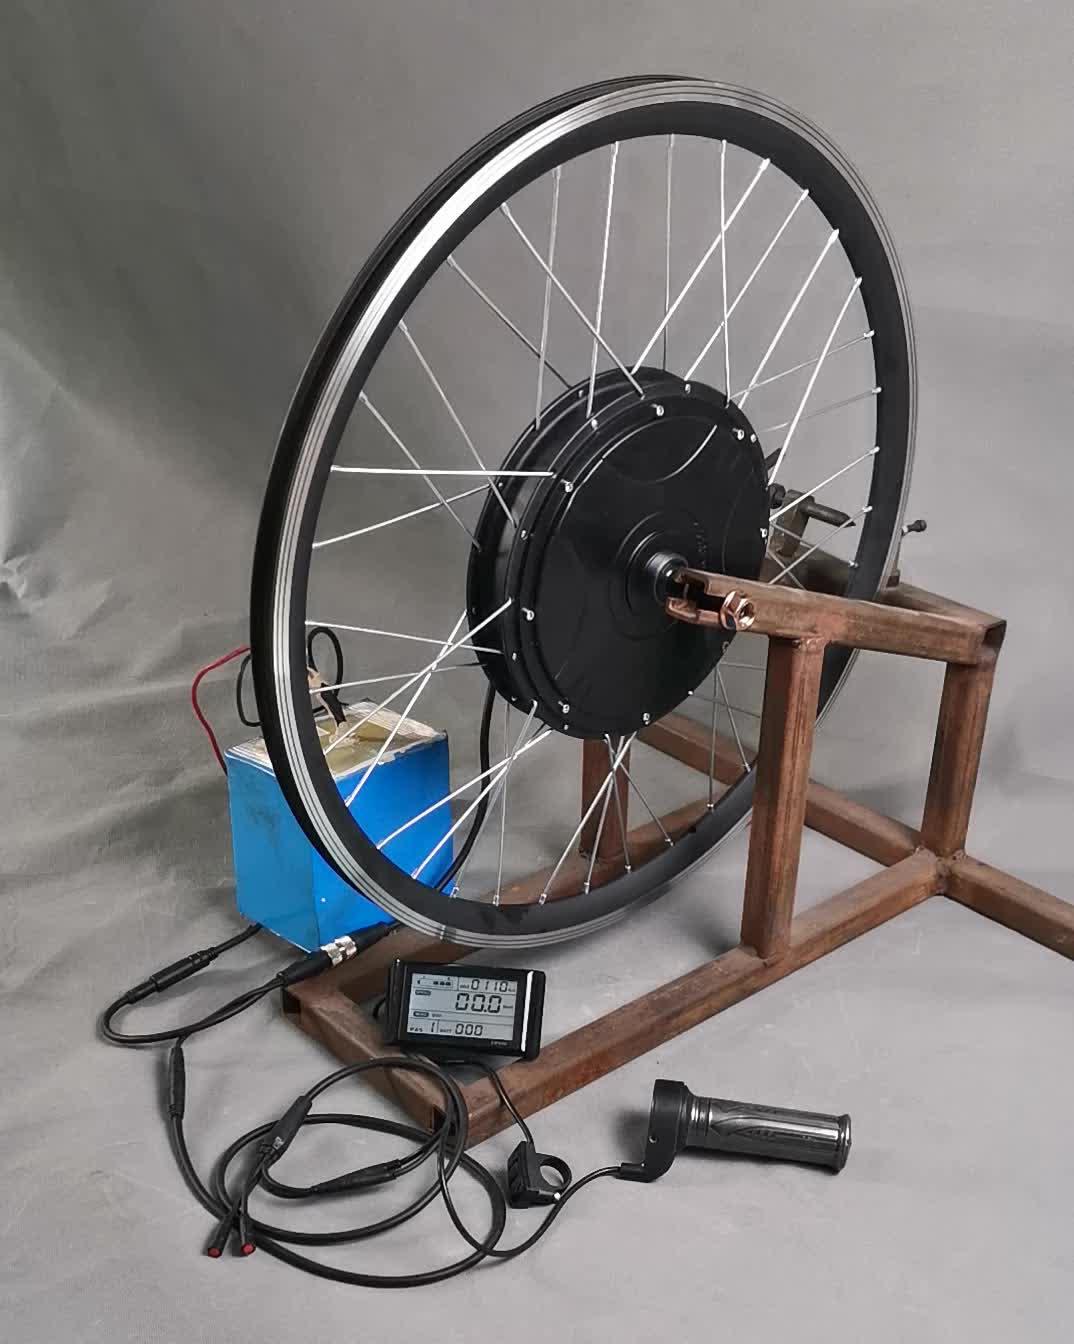 Kit Konversi Sepeda Listrik, Motor Sepeda Listrik Tanpa Sikat 48V 1000W